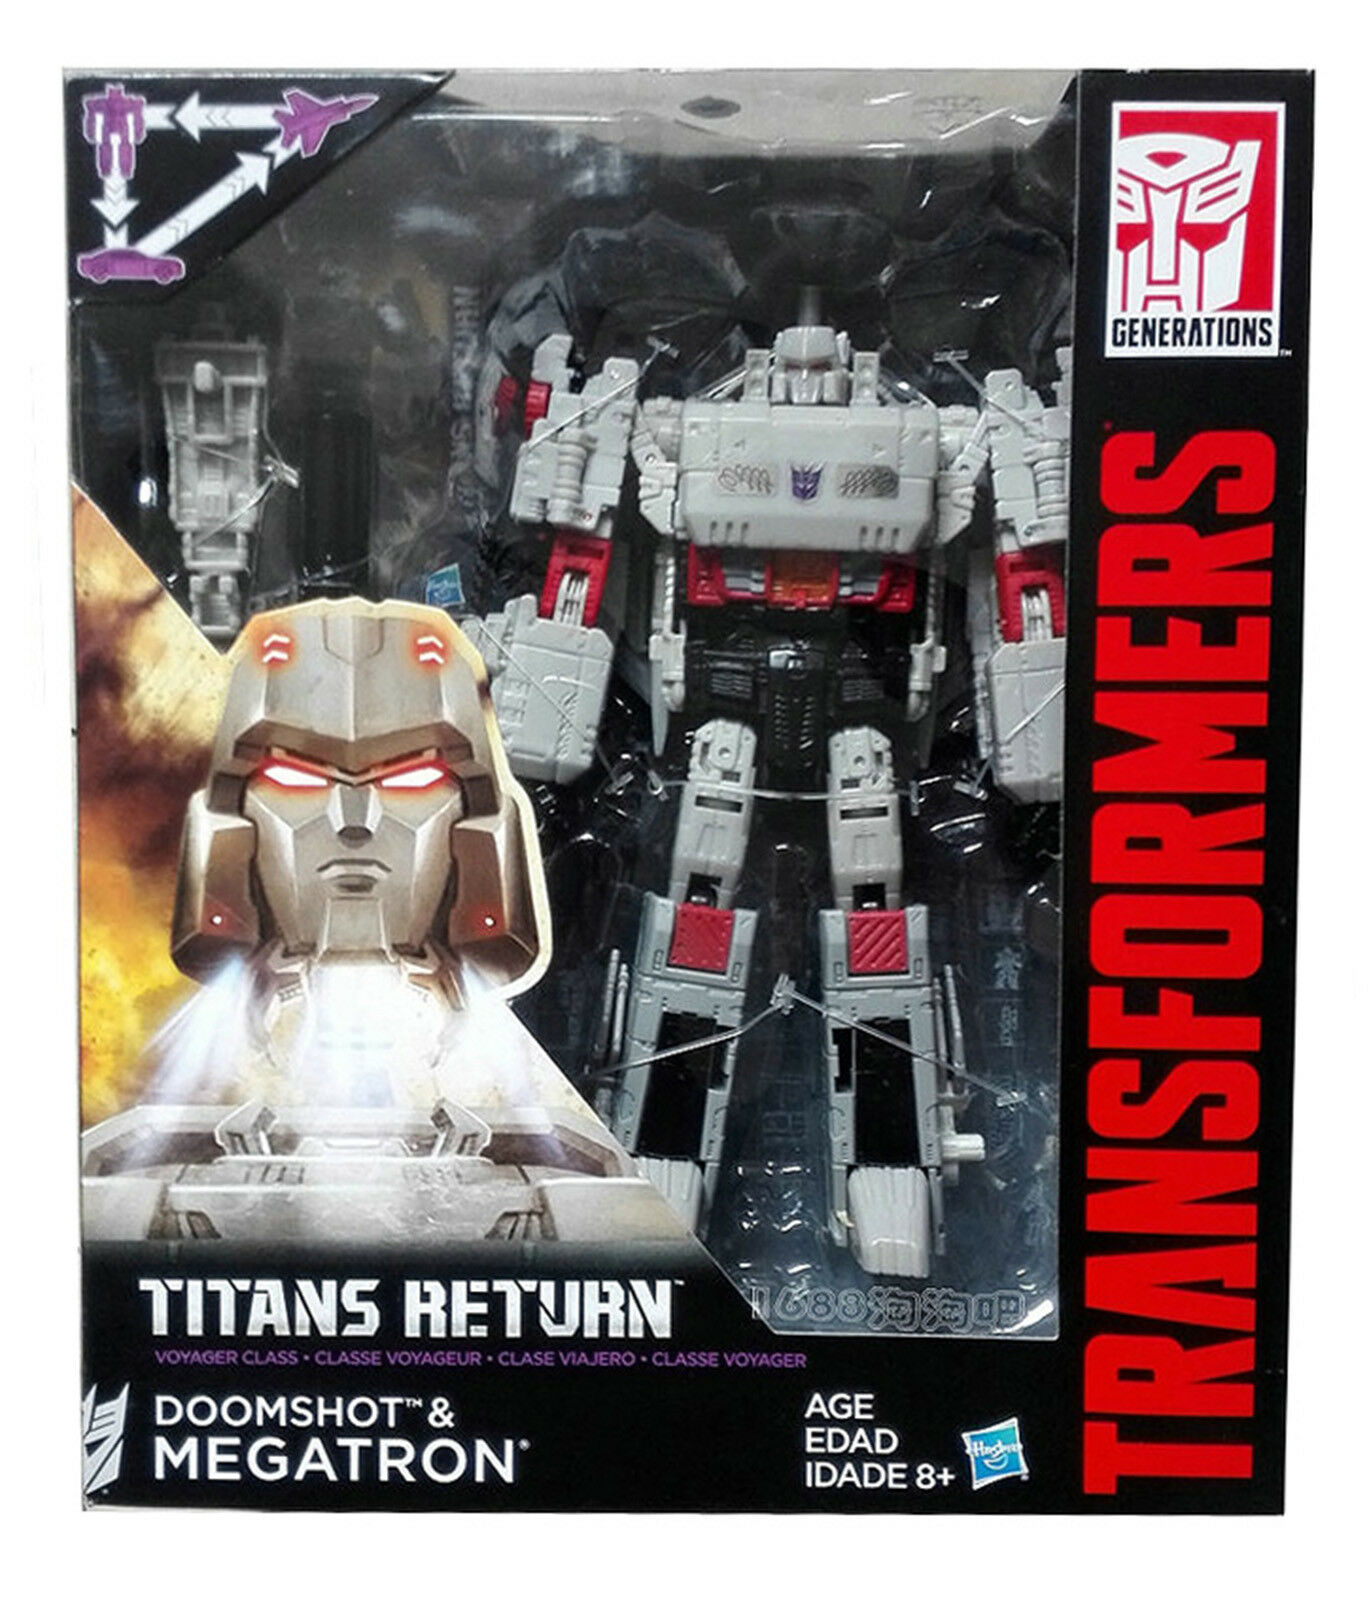 Hot Transformers Generations Titans Return DOOMSHOT & MEGATRON Voyager Class NEU